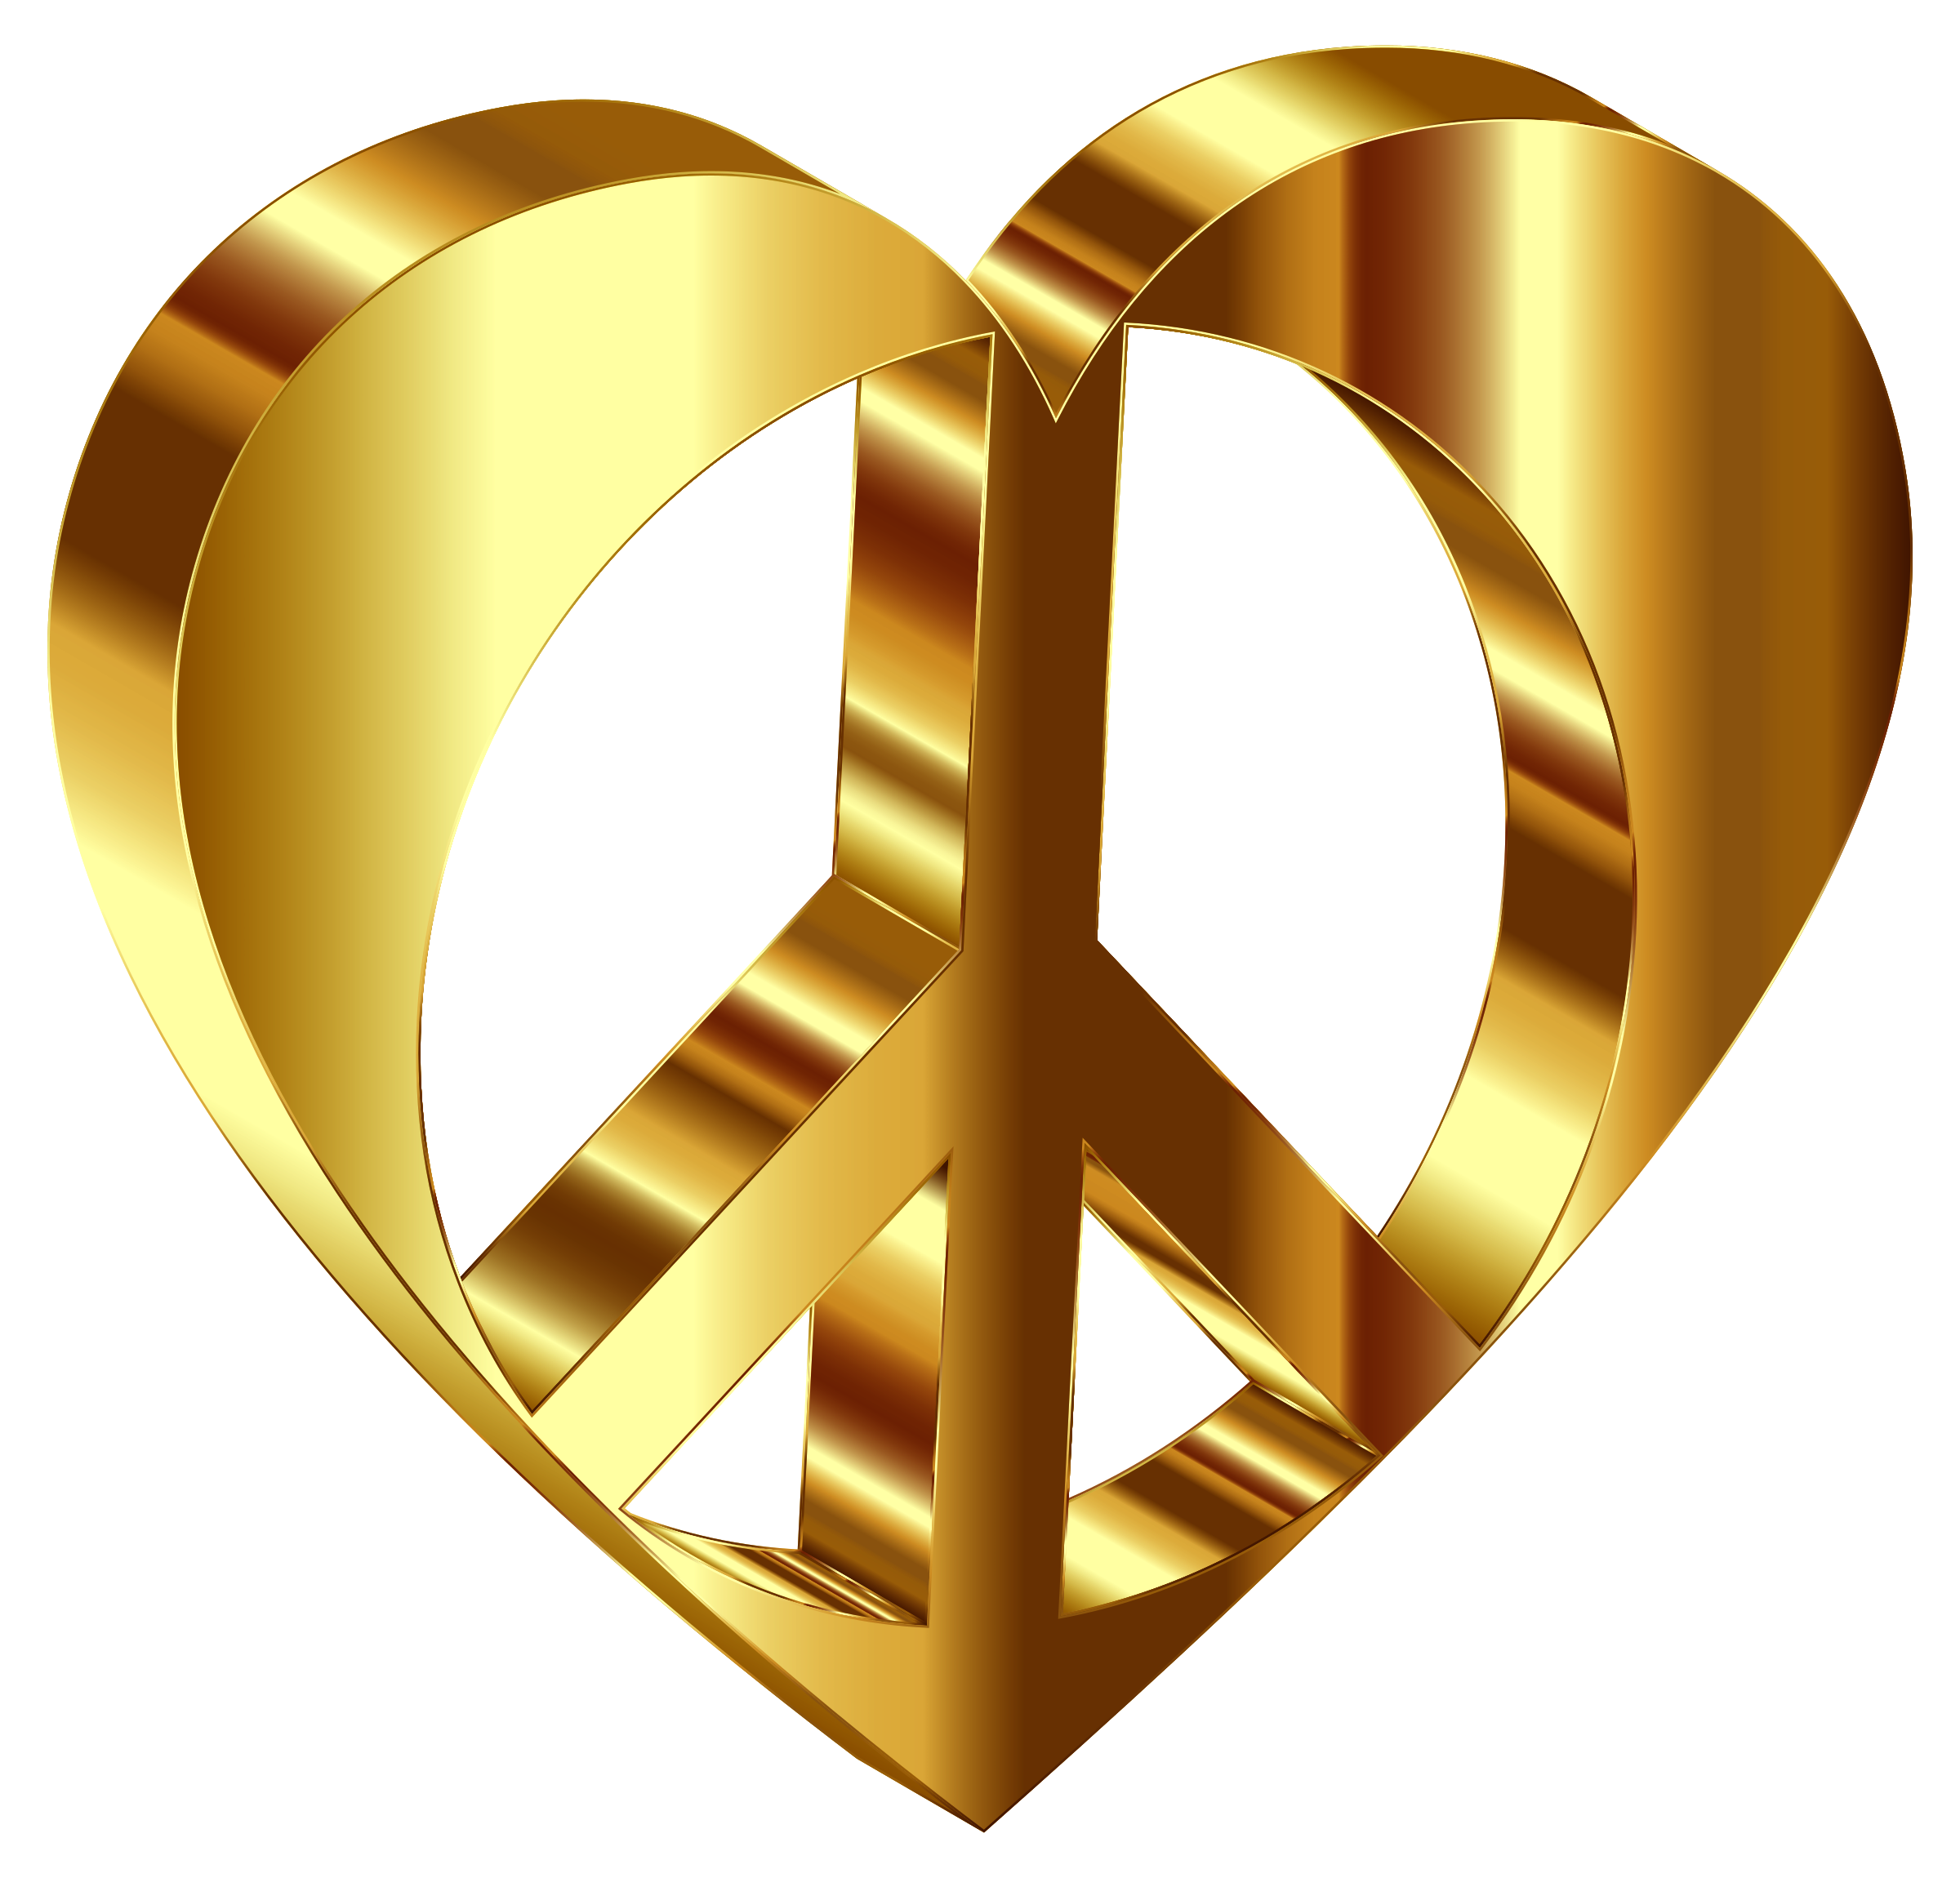 Heart With Arrow Images Stock Photos amp Vectors  Shutterstock